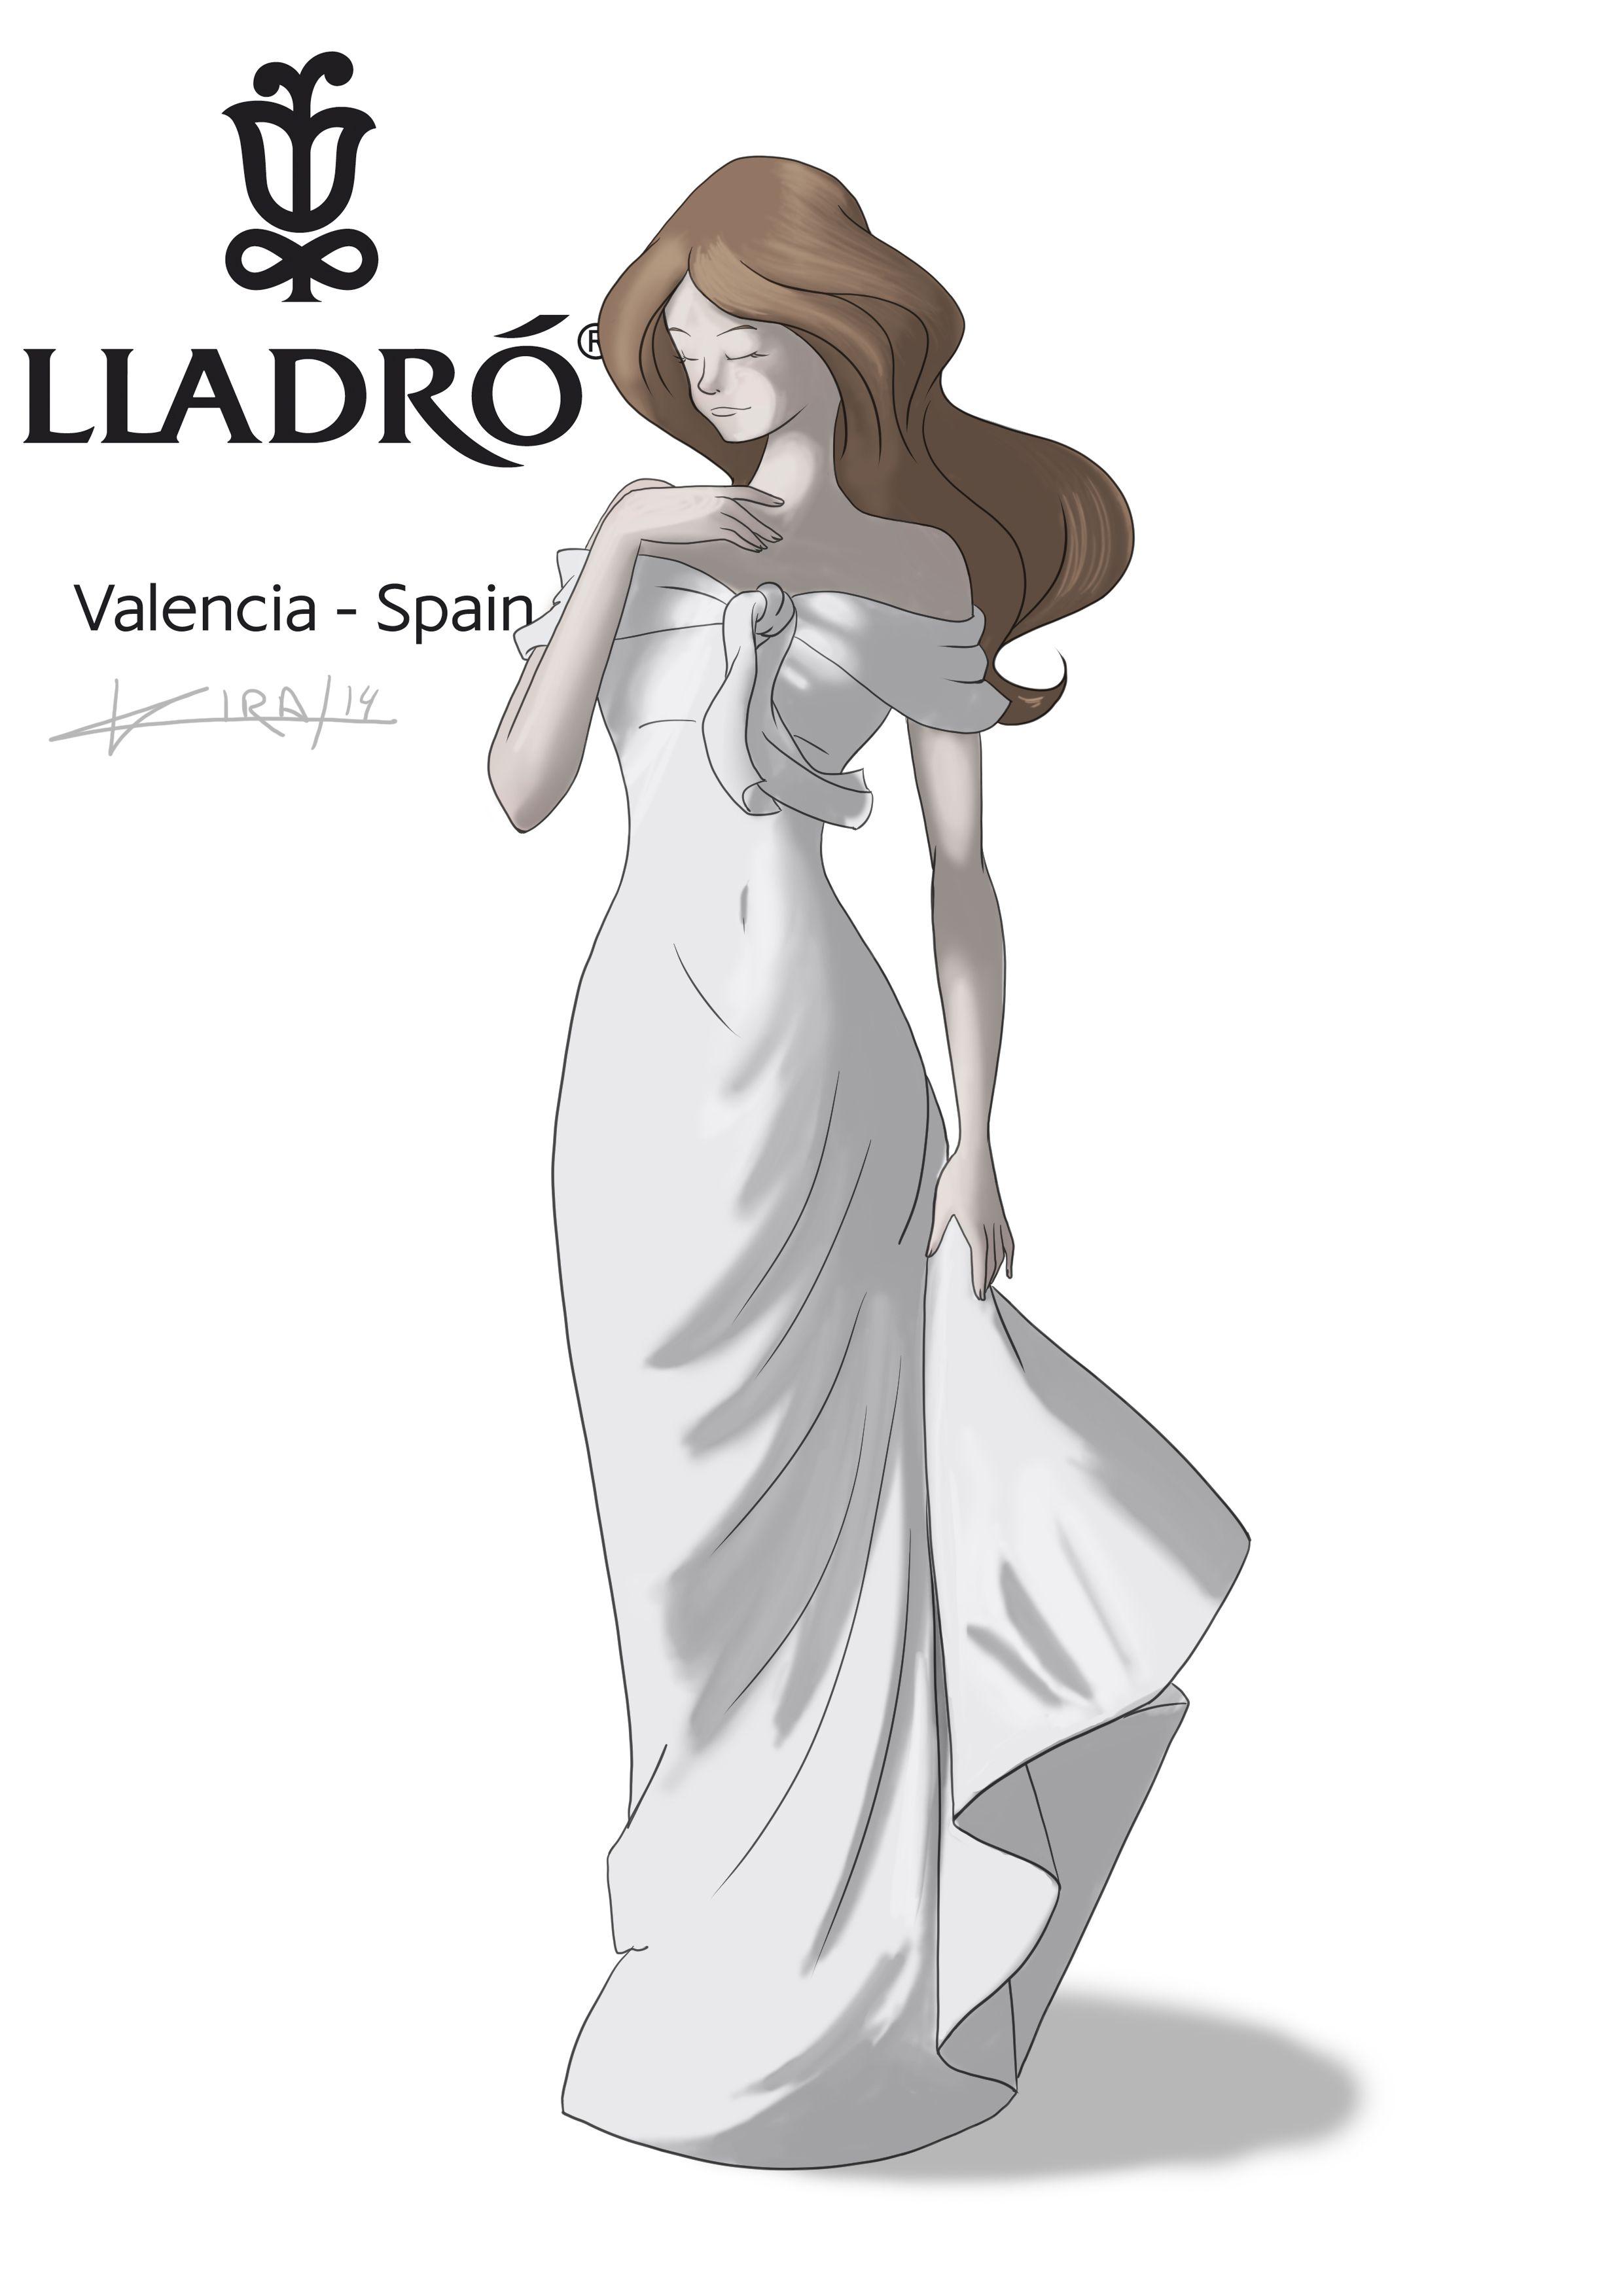 Una figura de Lladró que me encanta